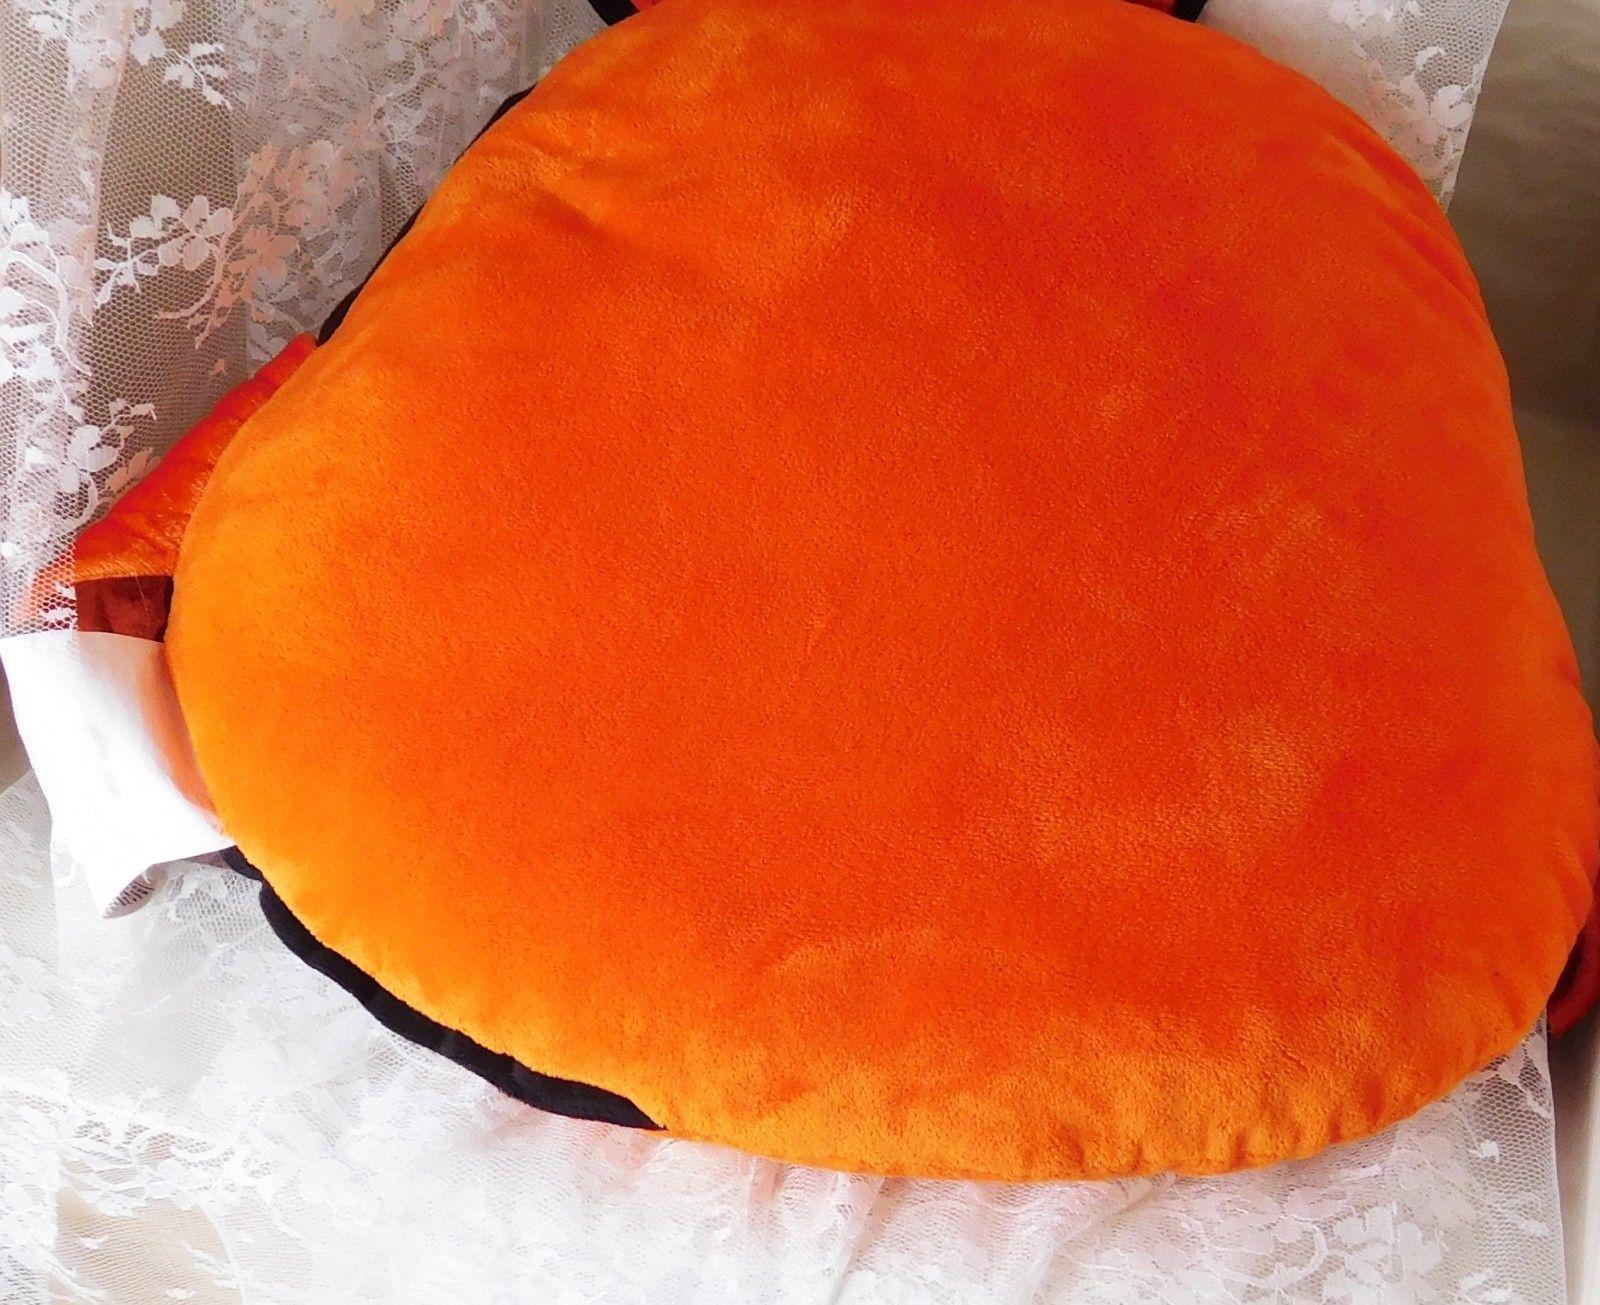 "Disney Store Plush Pillow - Extra Large Nemo from Finding Nemo - 20"" x 20"" x 2"""